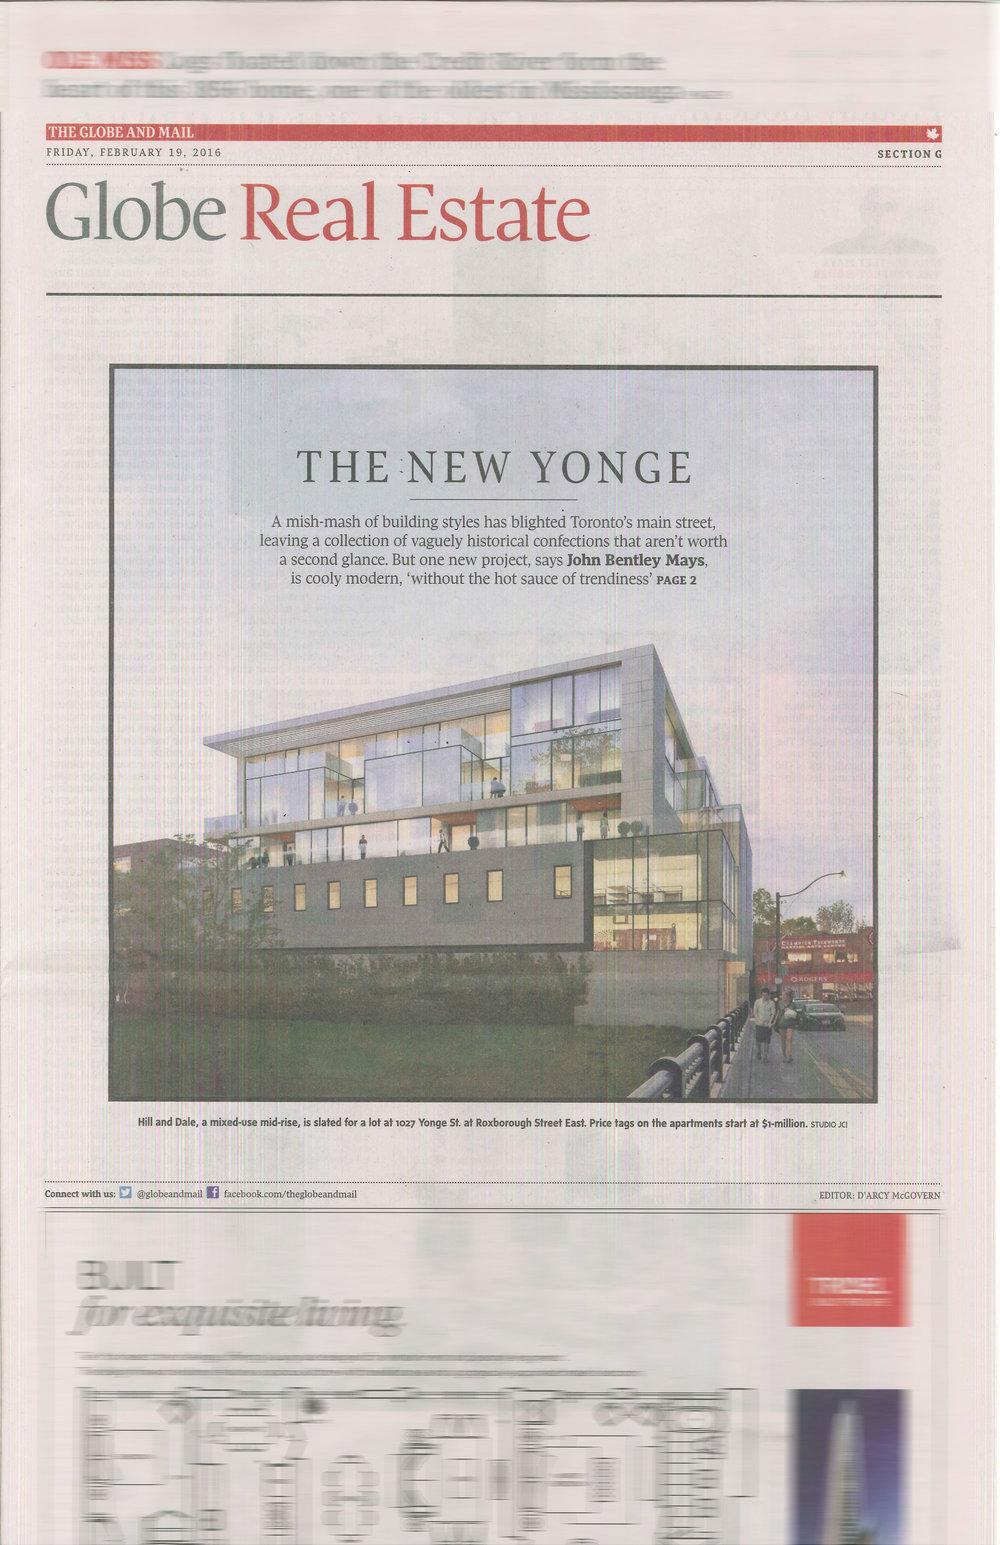 1027-Yonge_Globe-and-Mail_Page_2.jpg